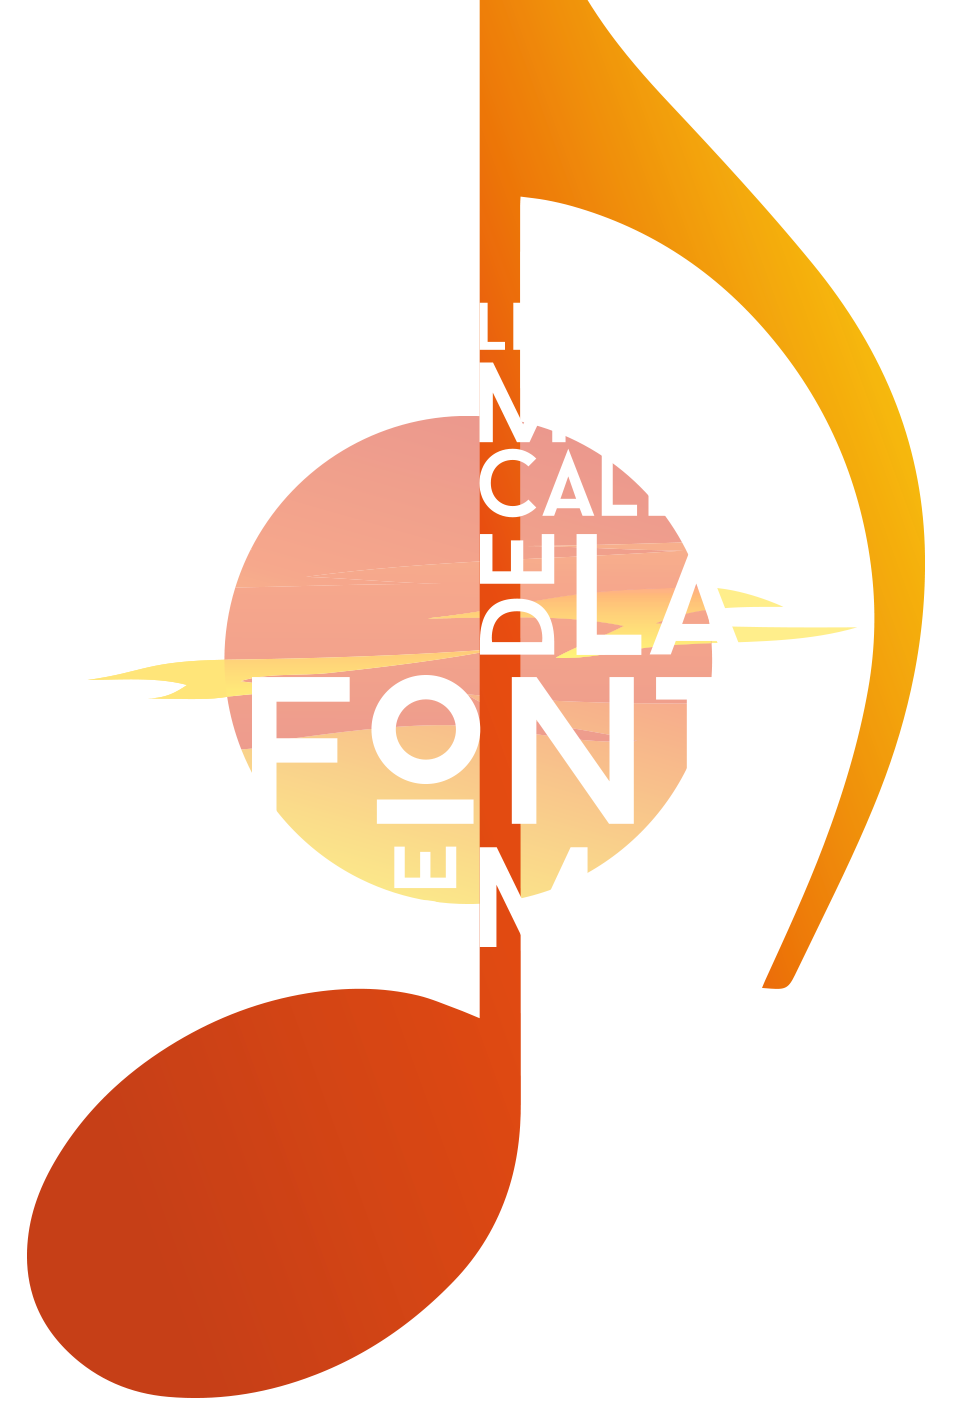 logo Les Musicales de la font de mai 2019